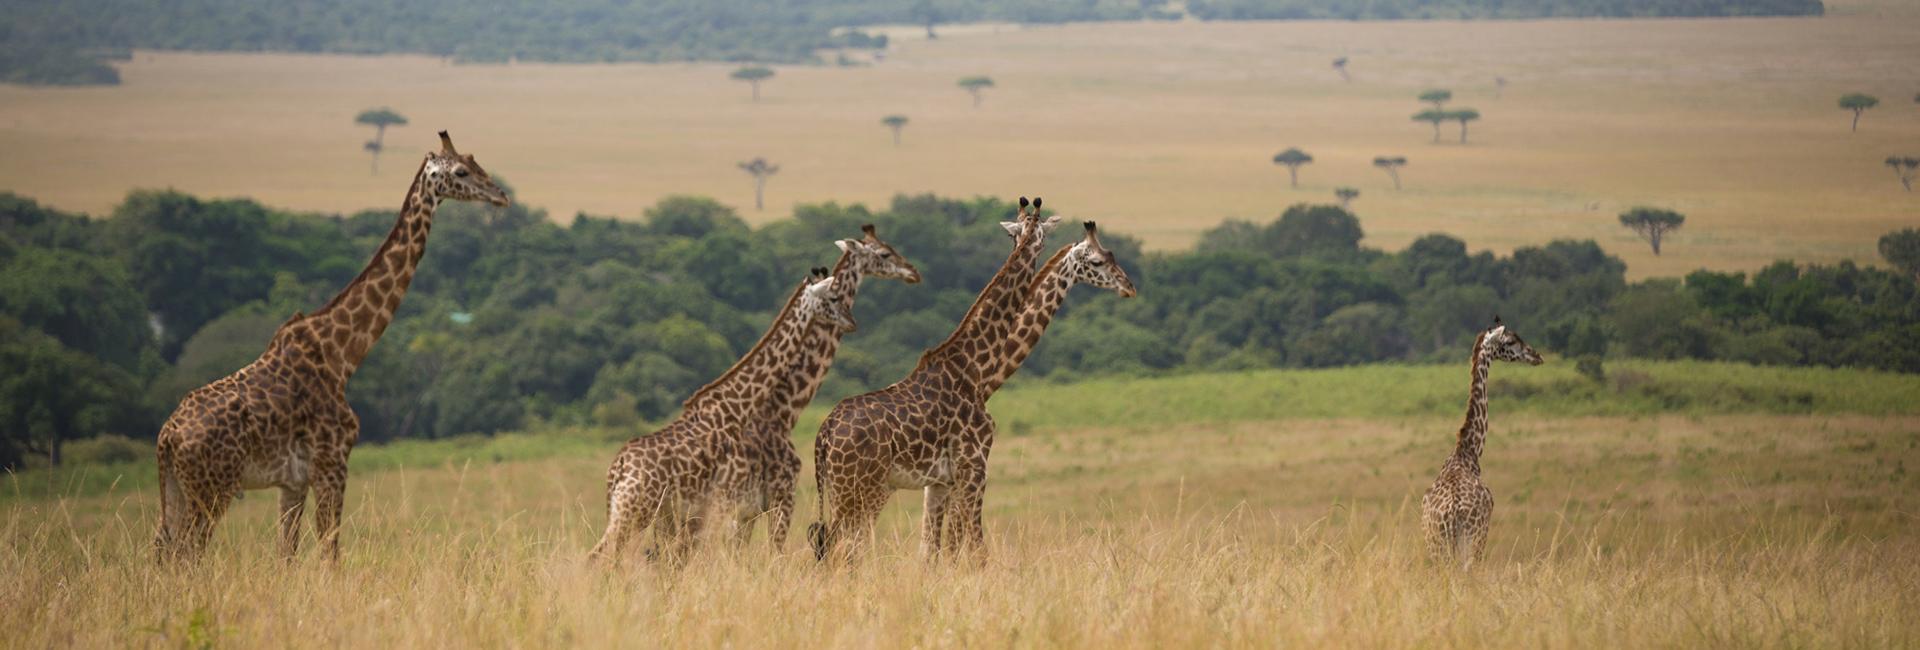 Tanzania Great Migration Experience East Africa Masaai Mara